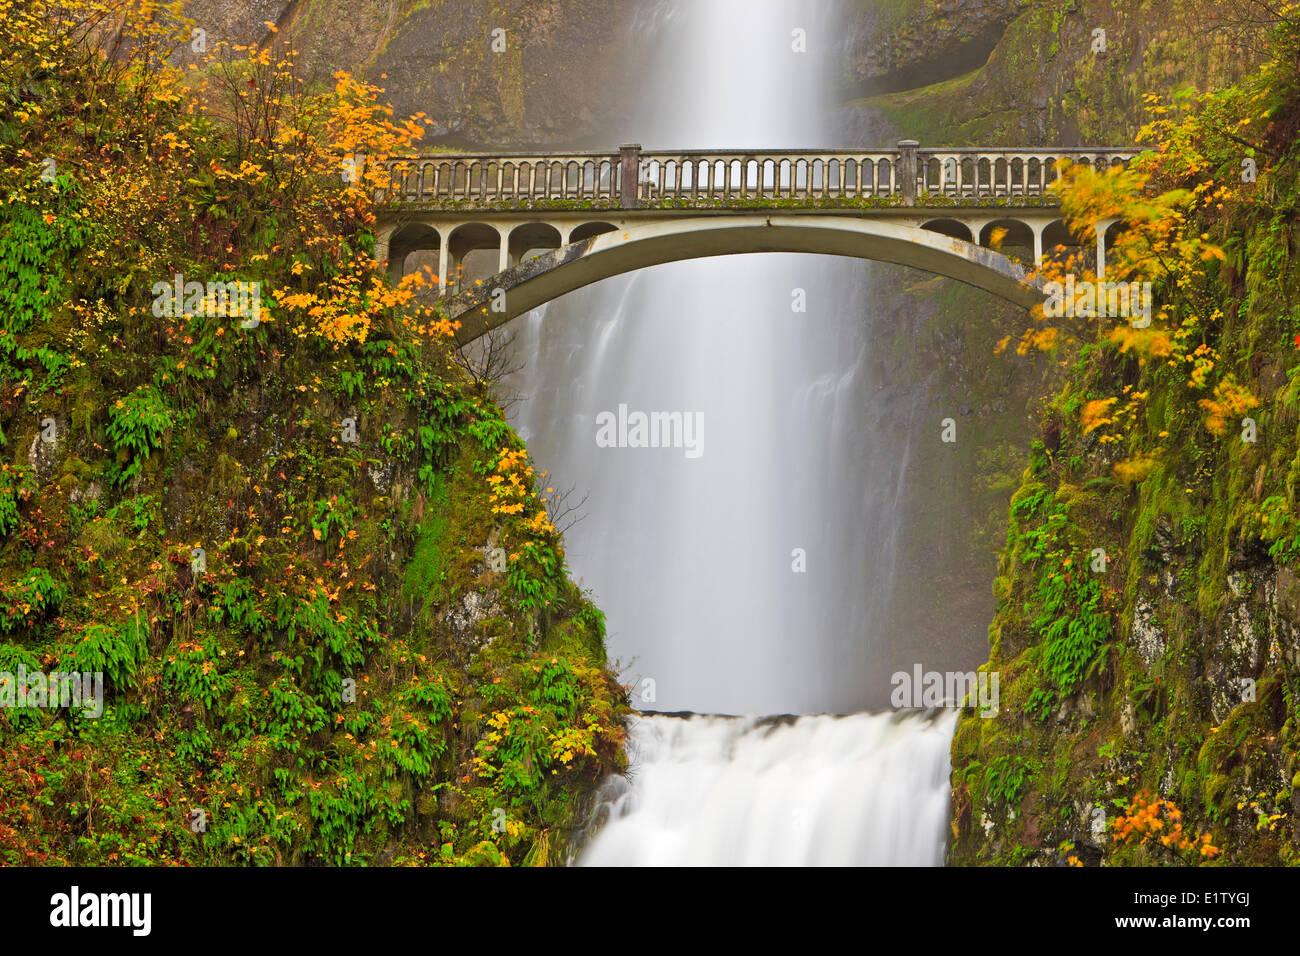 Multnomah Falls une attraction touristique 611-foot-tall roaring awe-inspiring cascade à la fin de l'automne Photo Stock